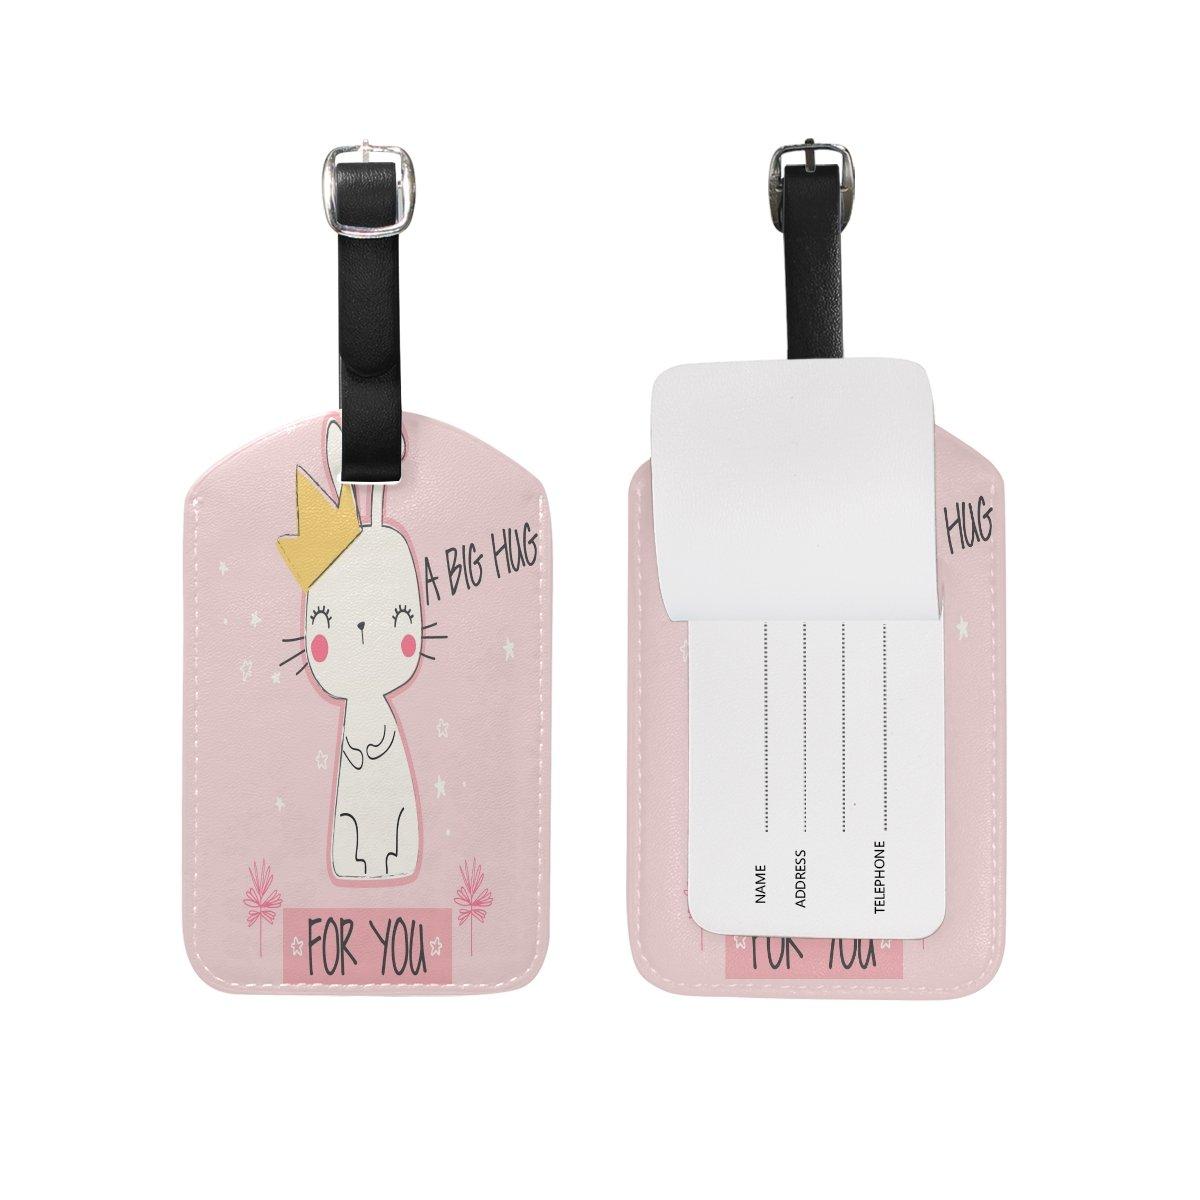 Saobao Travel Luggage Tag Cute Rabbit PU Leather Baggage Suitcase Travel ID Bag Tag 1Pcs